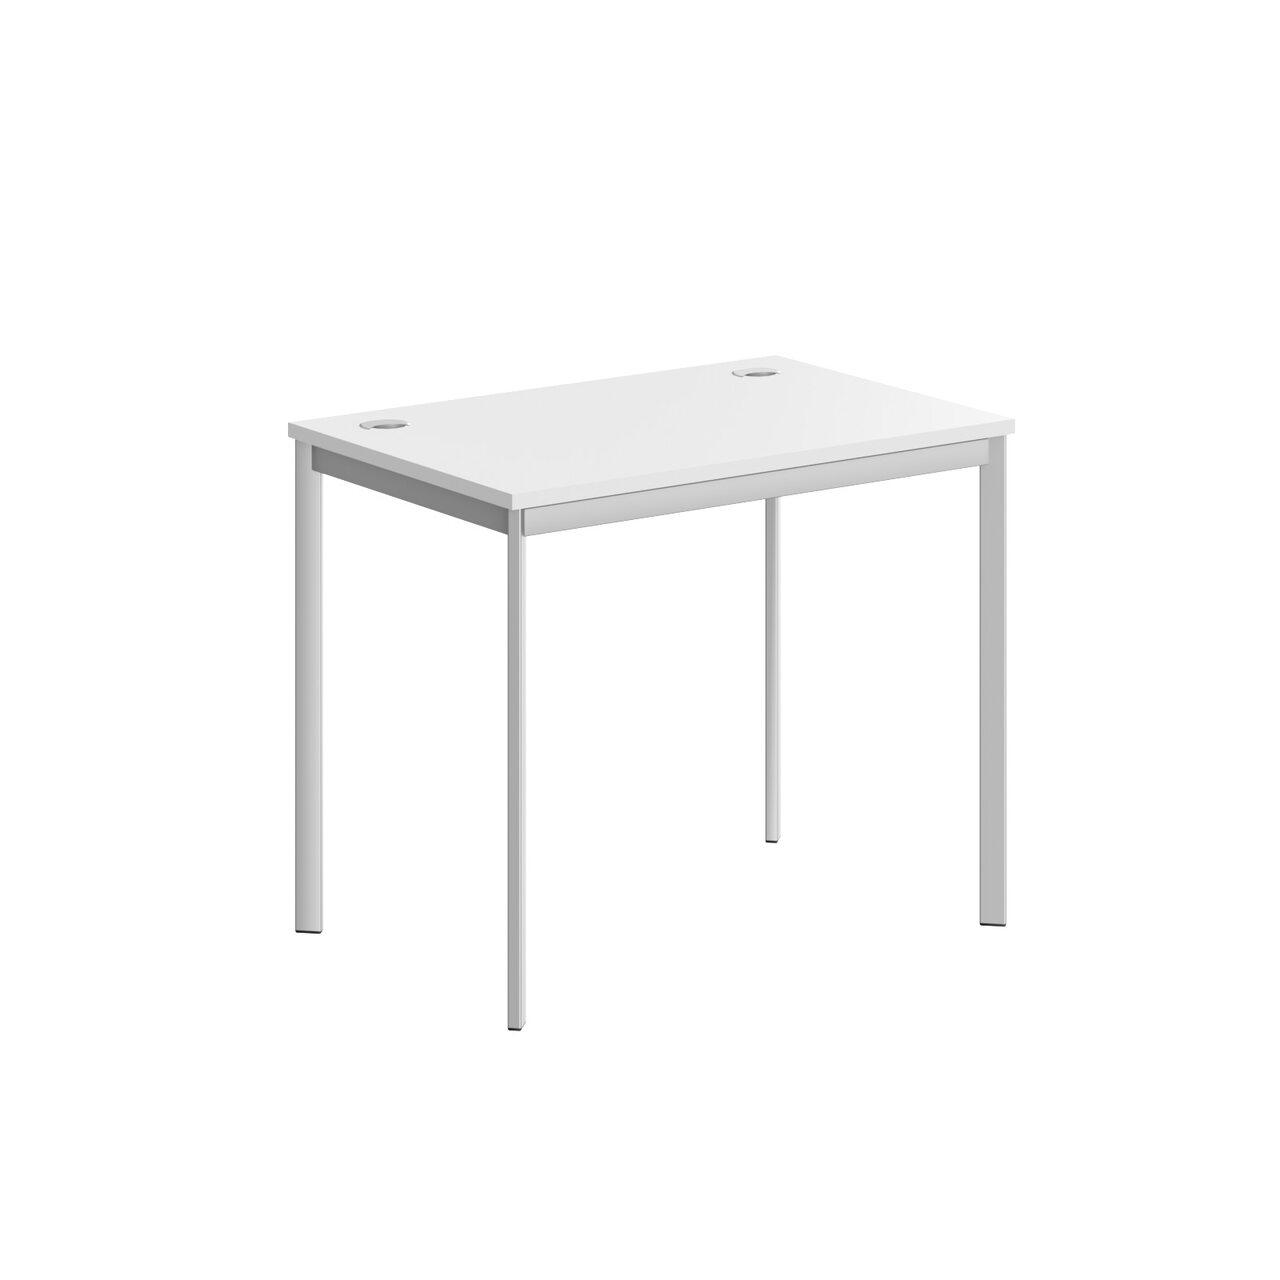 Стол прямой  IMAGO-S 90x60x76 - фото 2